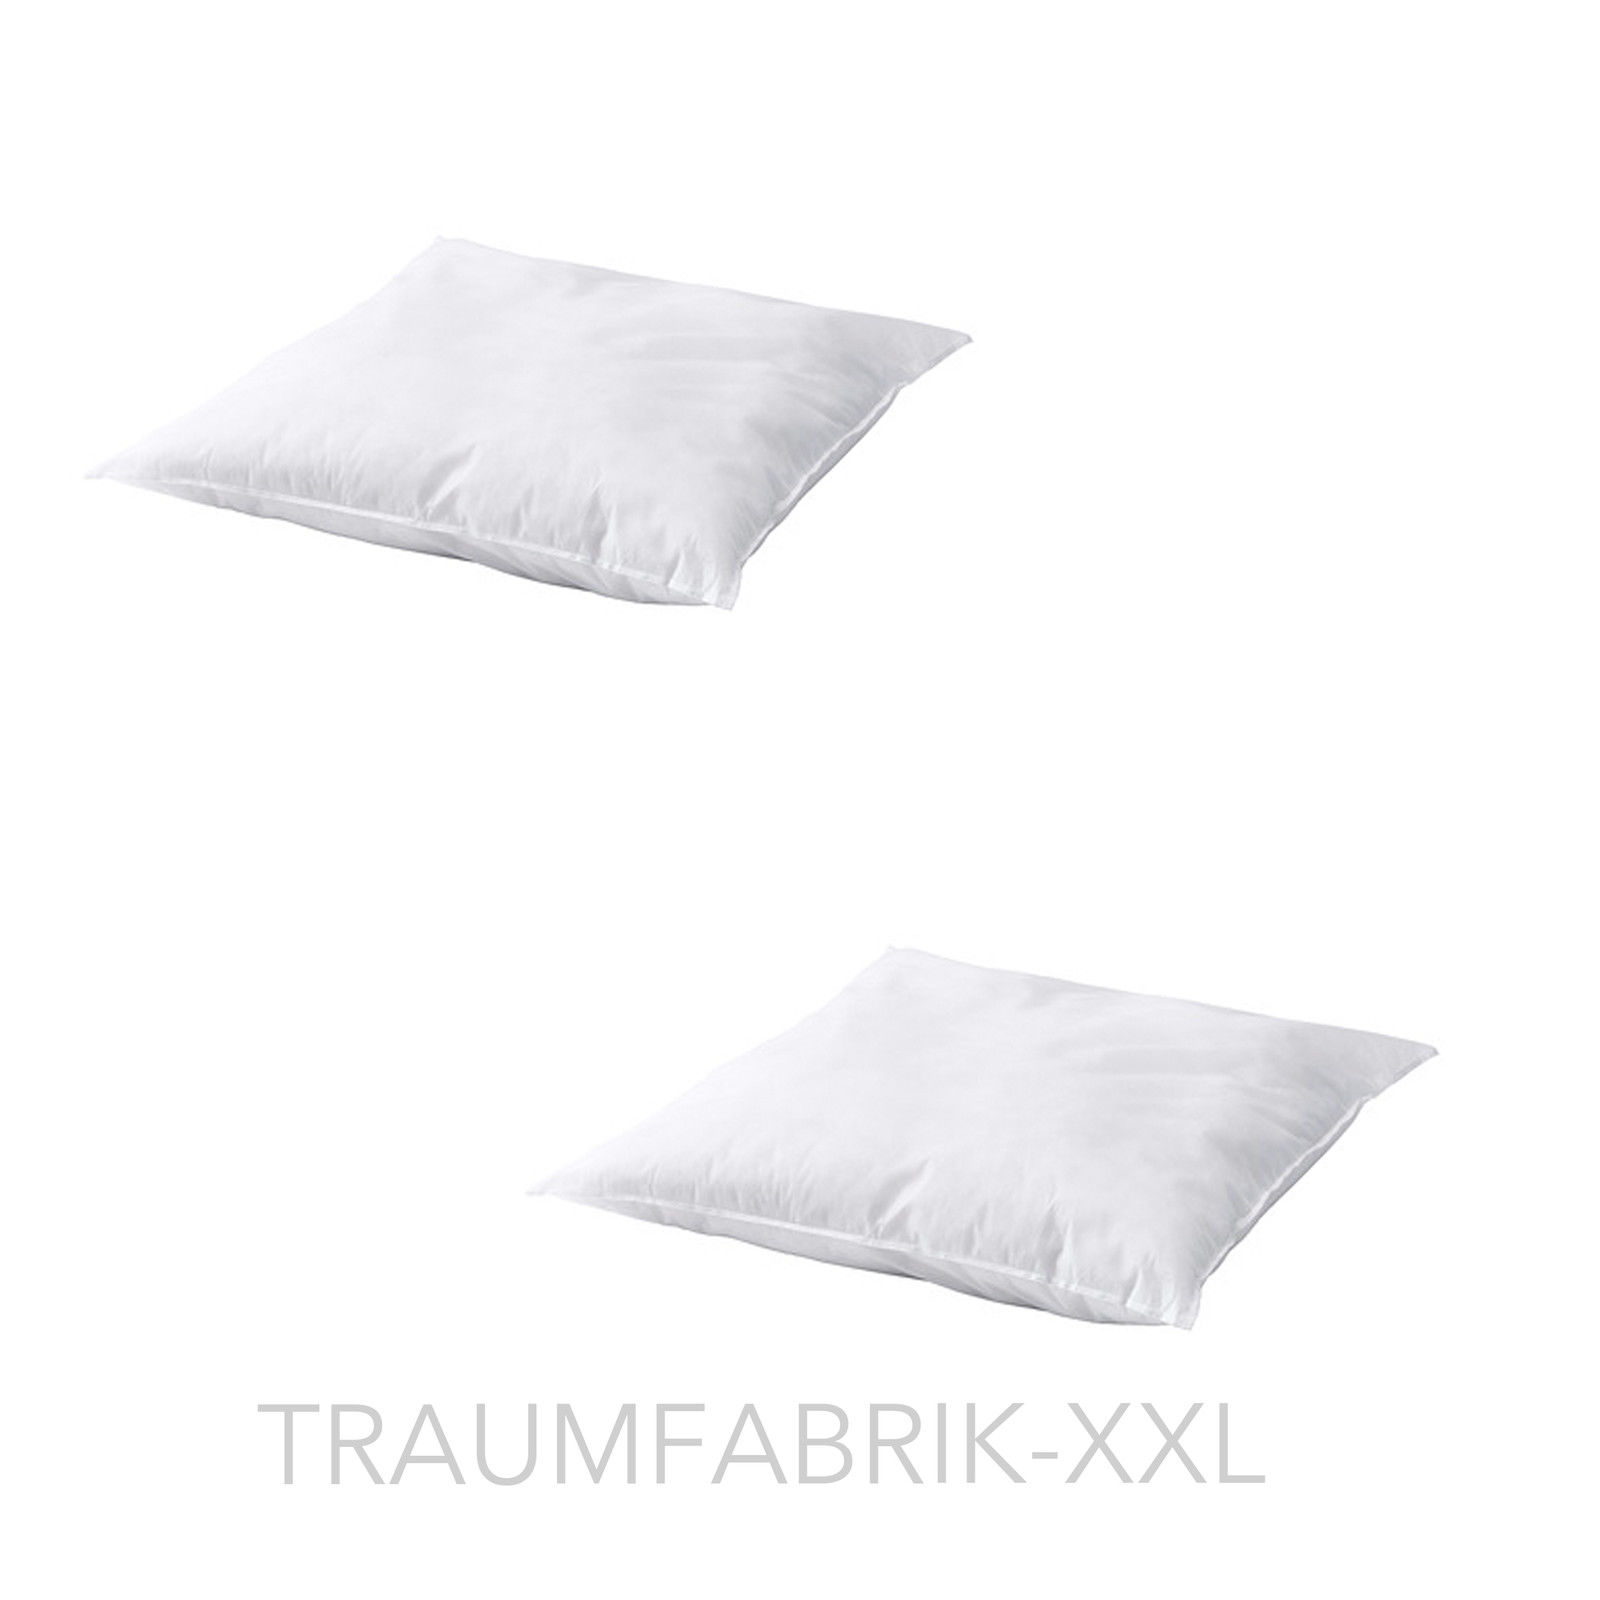 2 st ck kopfkissen kissen 80 80 cm 80 x 80 cm 80 80 cm inlett f llung neu ovp traumfabrik xxl. Black Bedroom Furniture Sets. Home Design Ideas